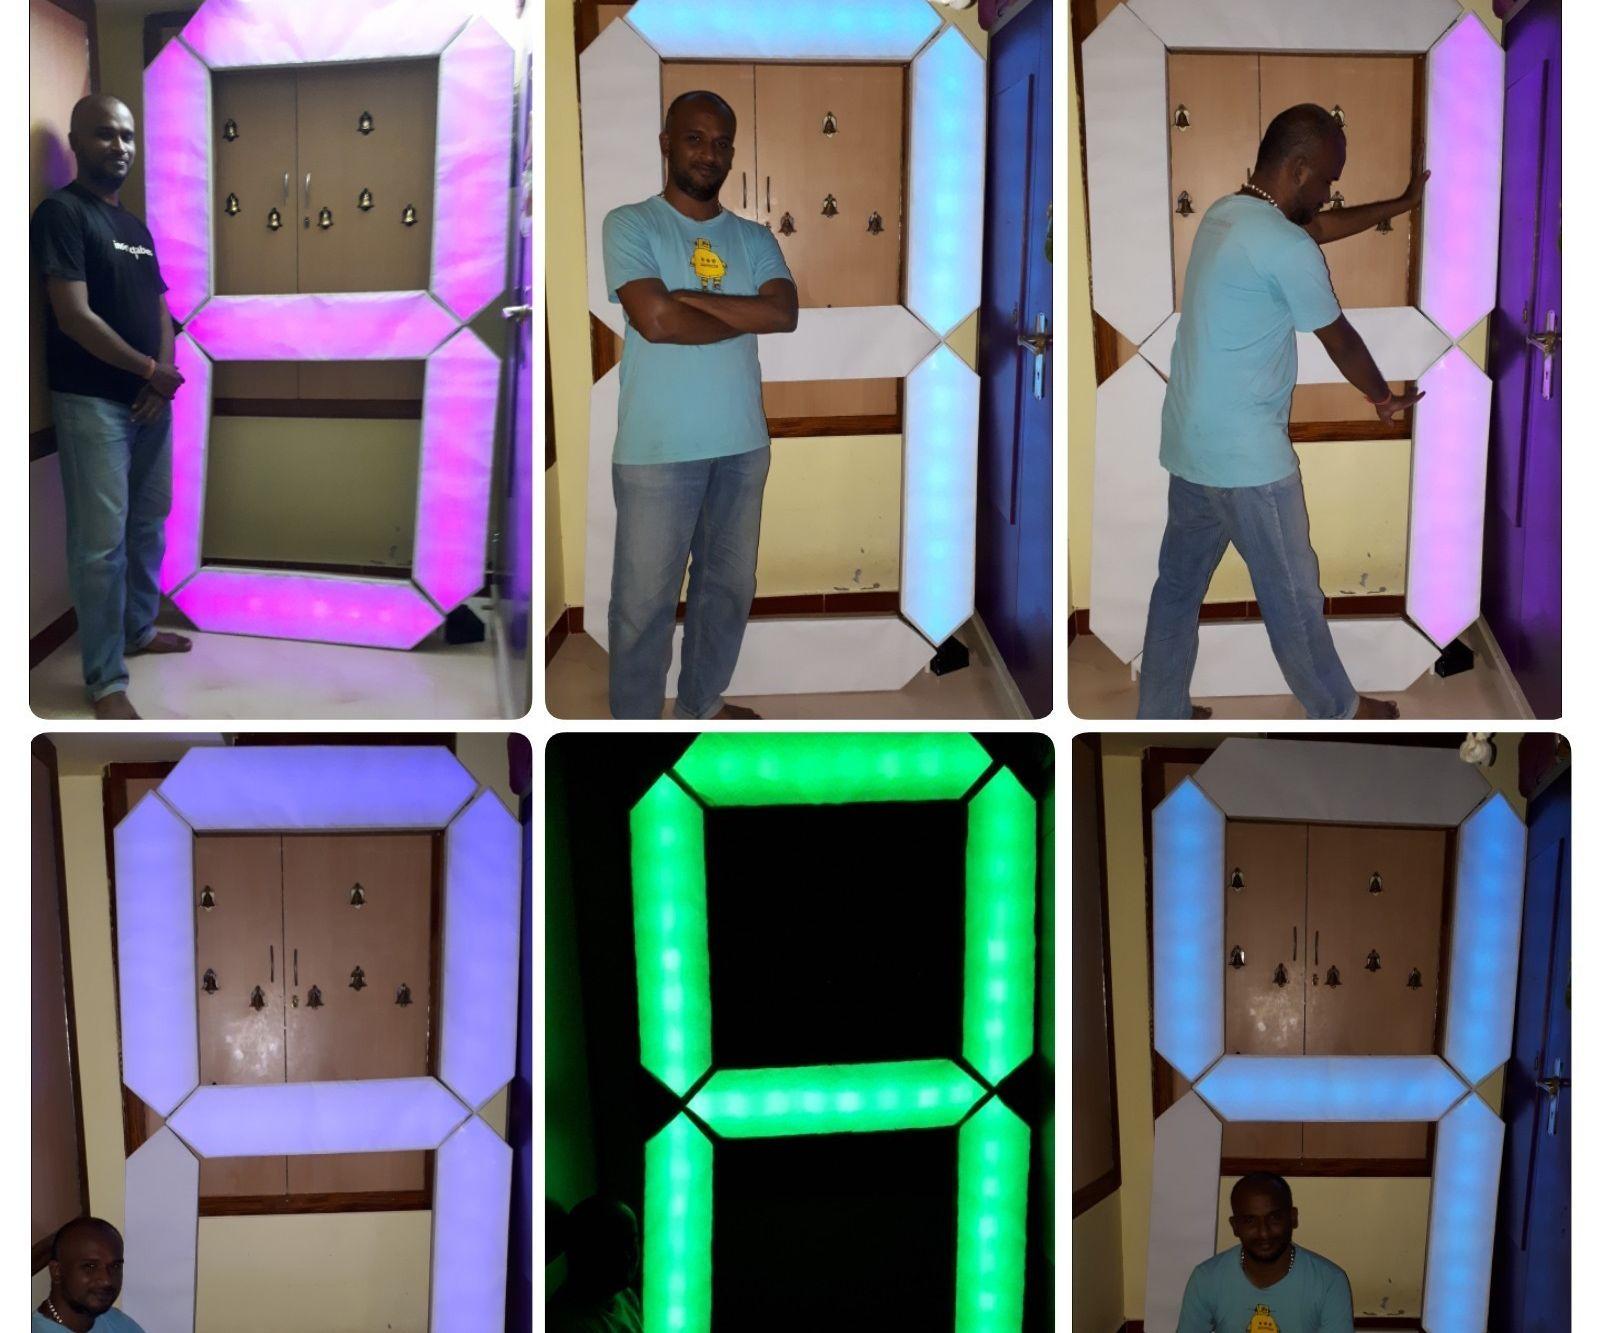 7 Feet 7 Segment Display With BT App